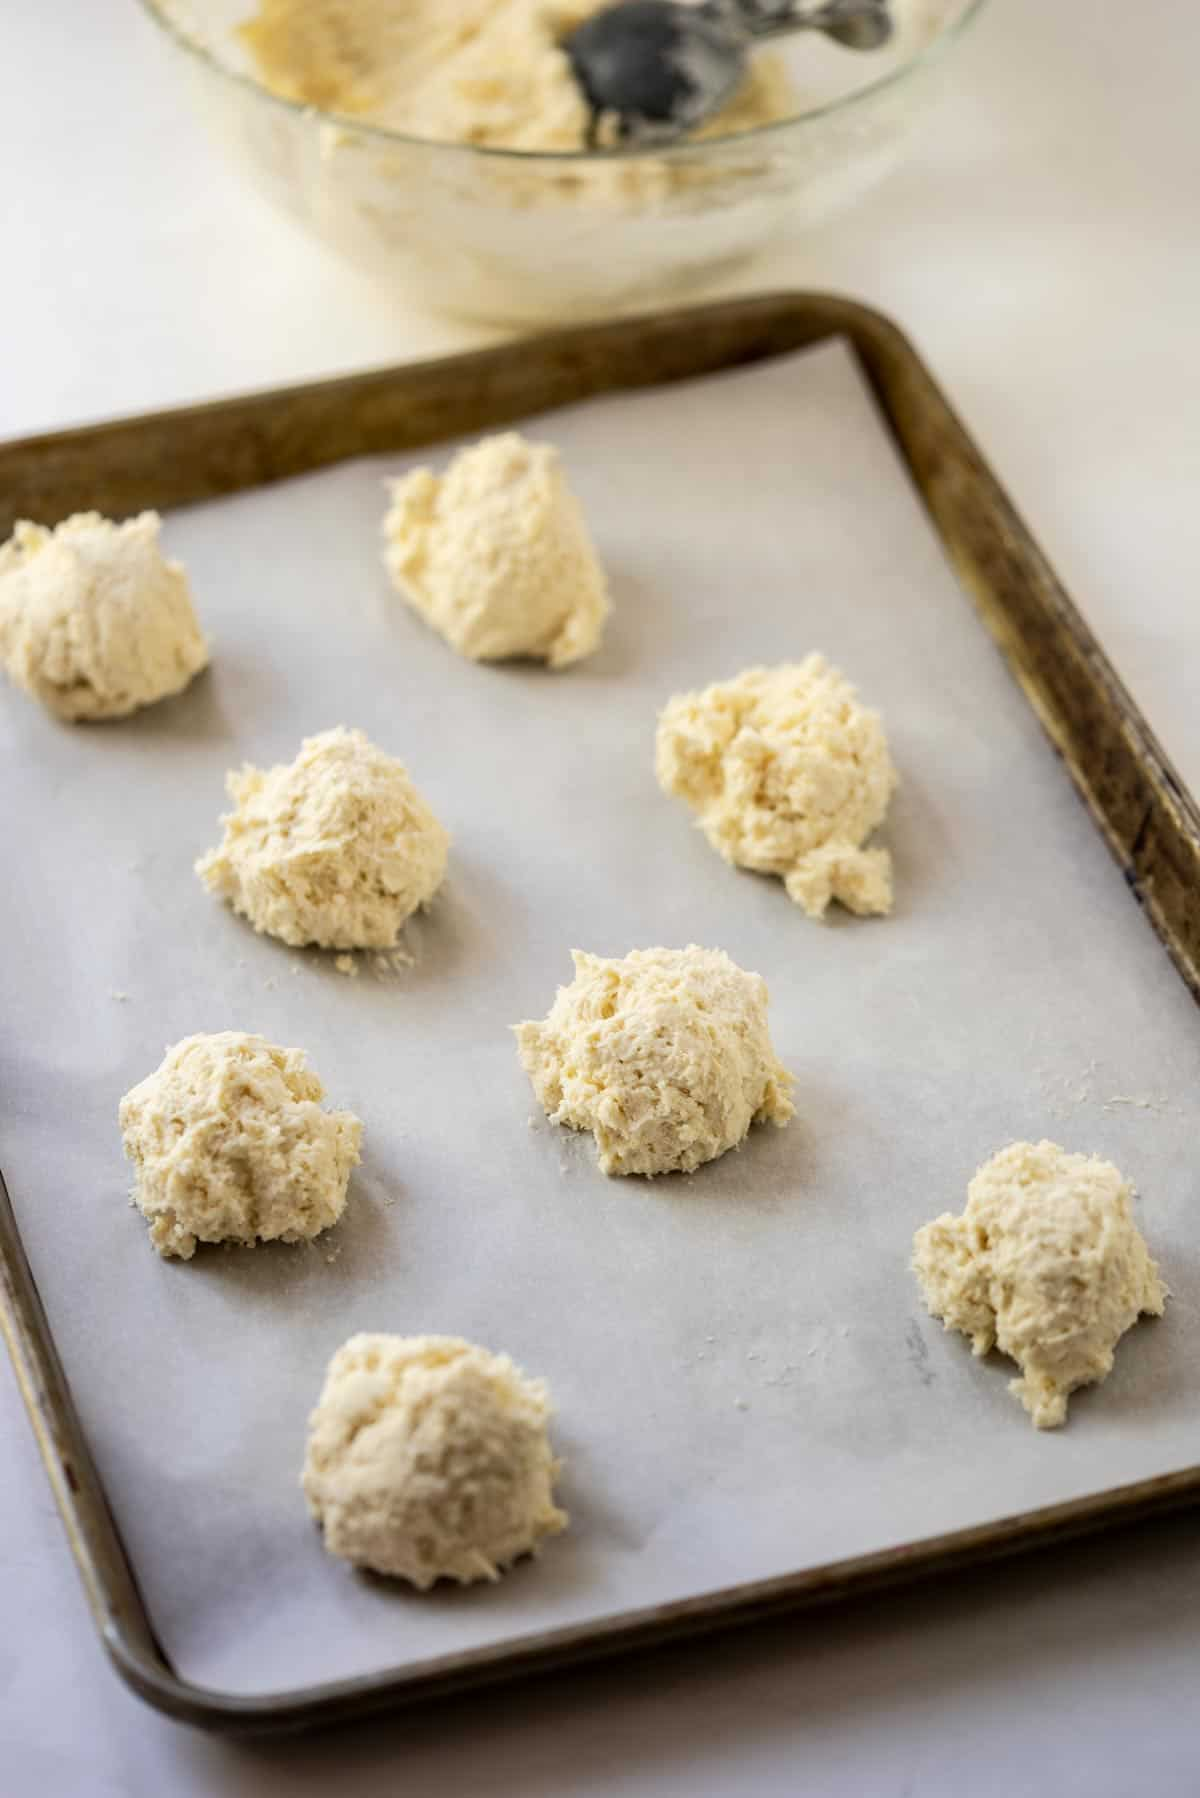 Drop biscuit dough on a baking sheet